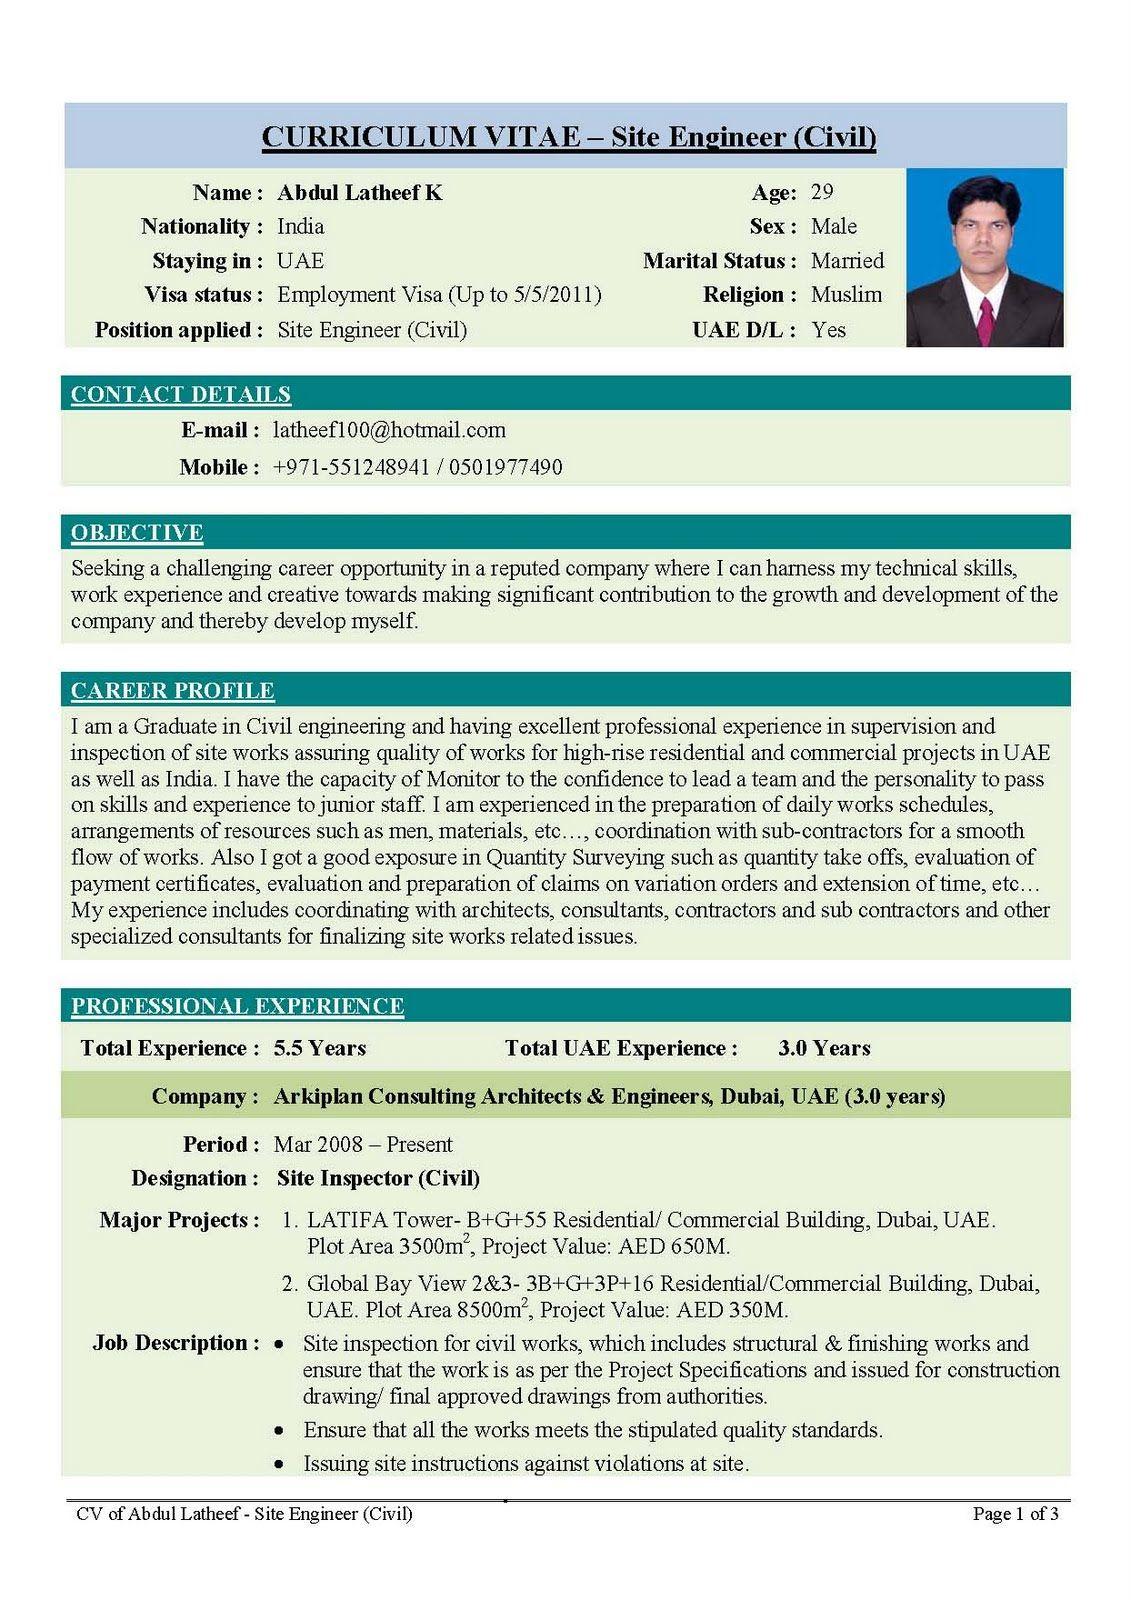 civil engineer resume sample httpwwwresumecareerinfocivil engineer resume sample 11